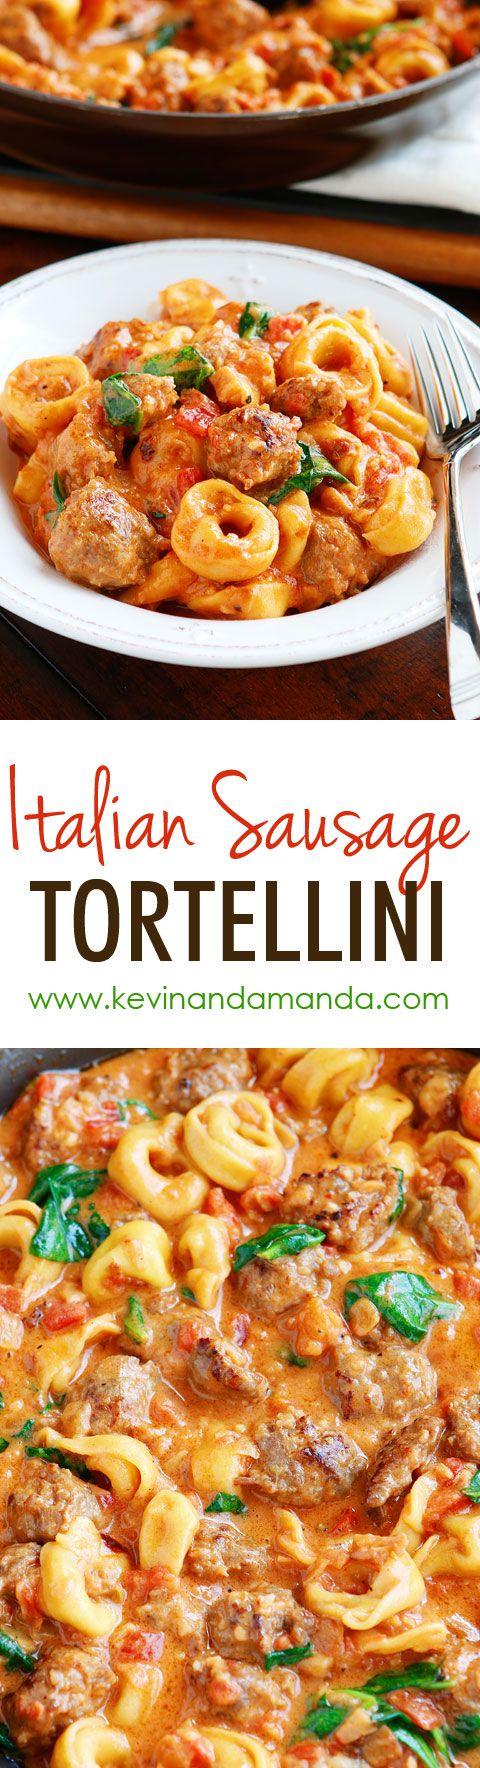 Italian Sausage Tortellini Our Favorite Tortellini Recipes Recipe Tortellini Recipes Recipes Food